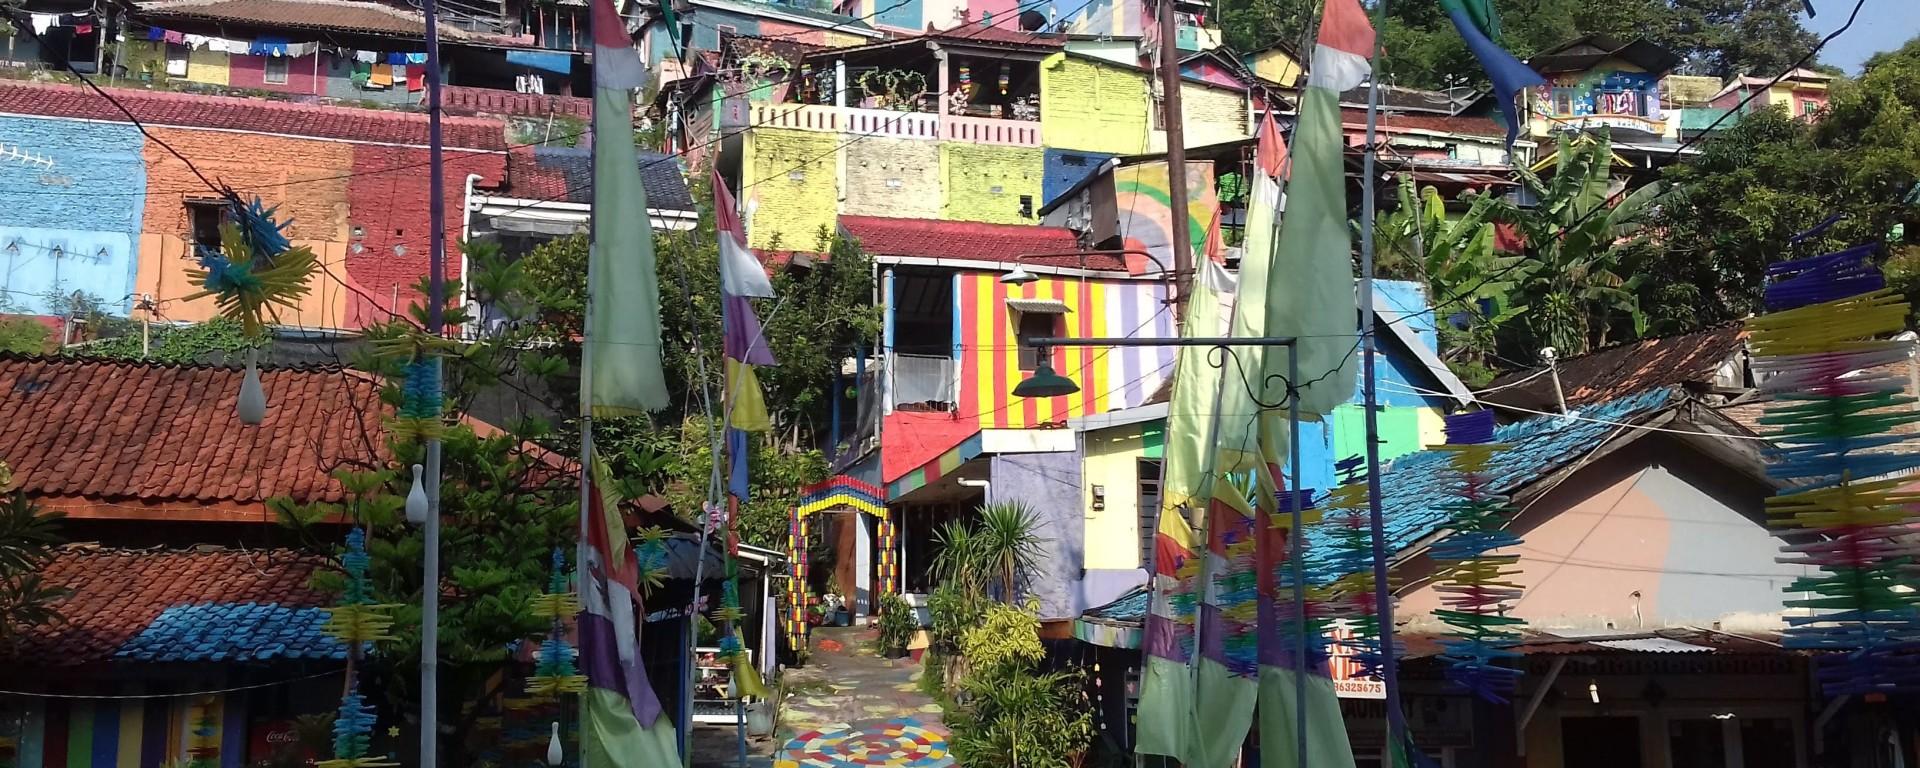 rainbow village, semarang